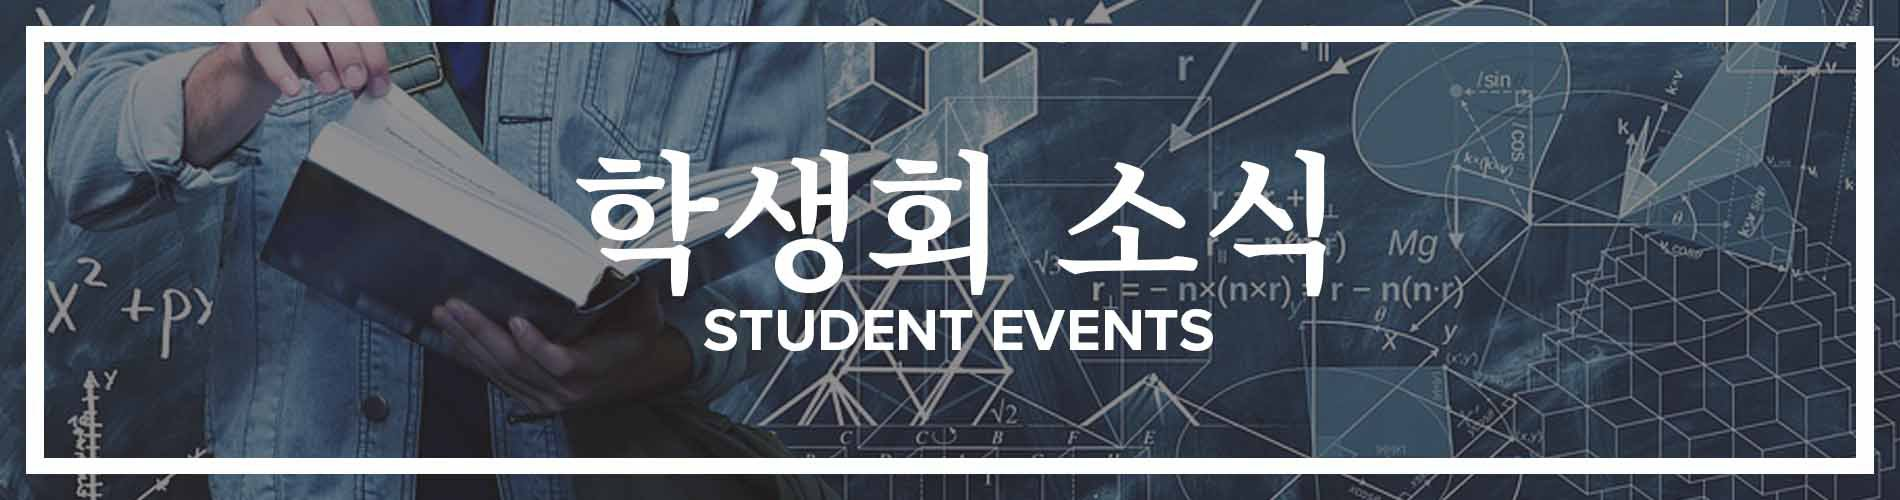 Student Events - Korean Banner